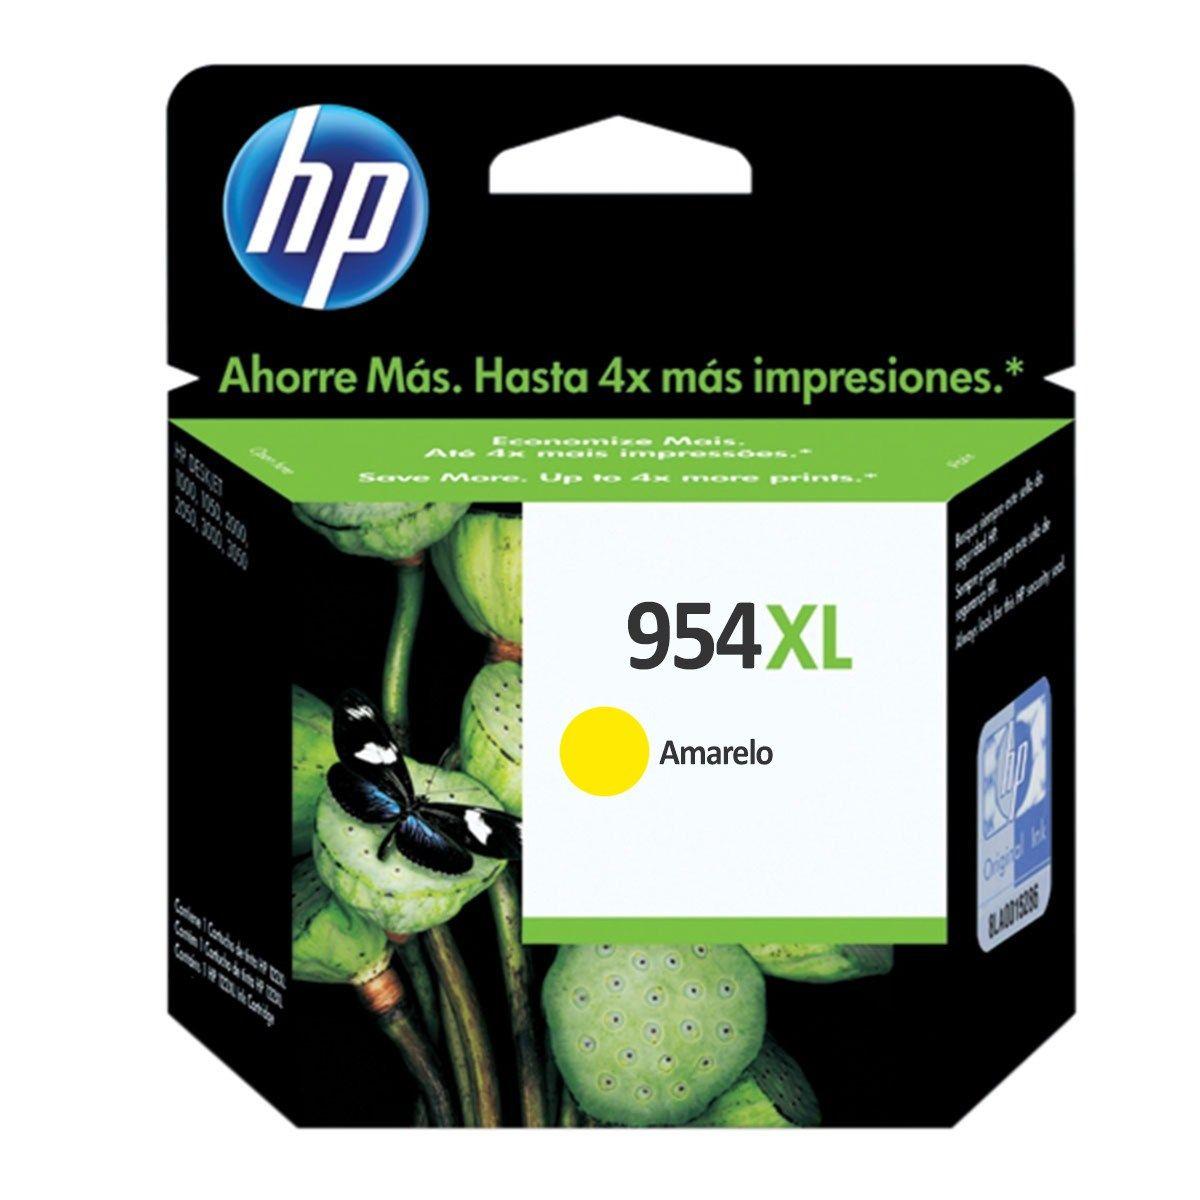 Cartucho HP 954XL Amarelo Original (L0S68AB) 20ml